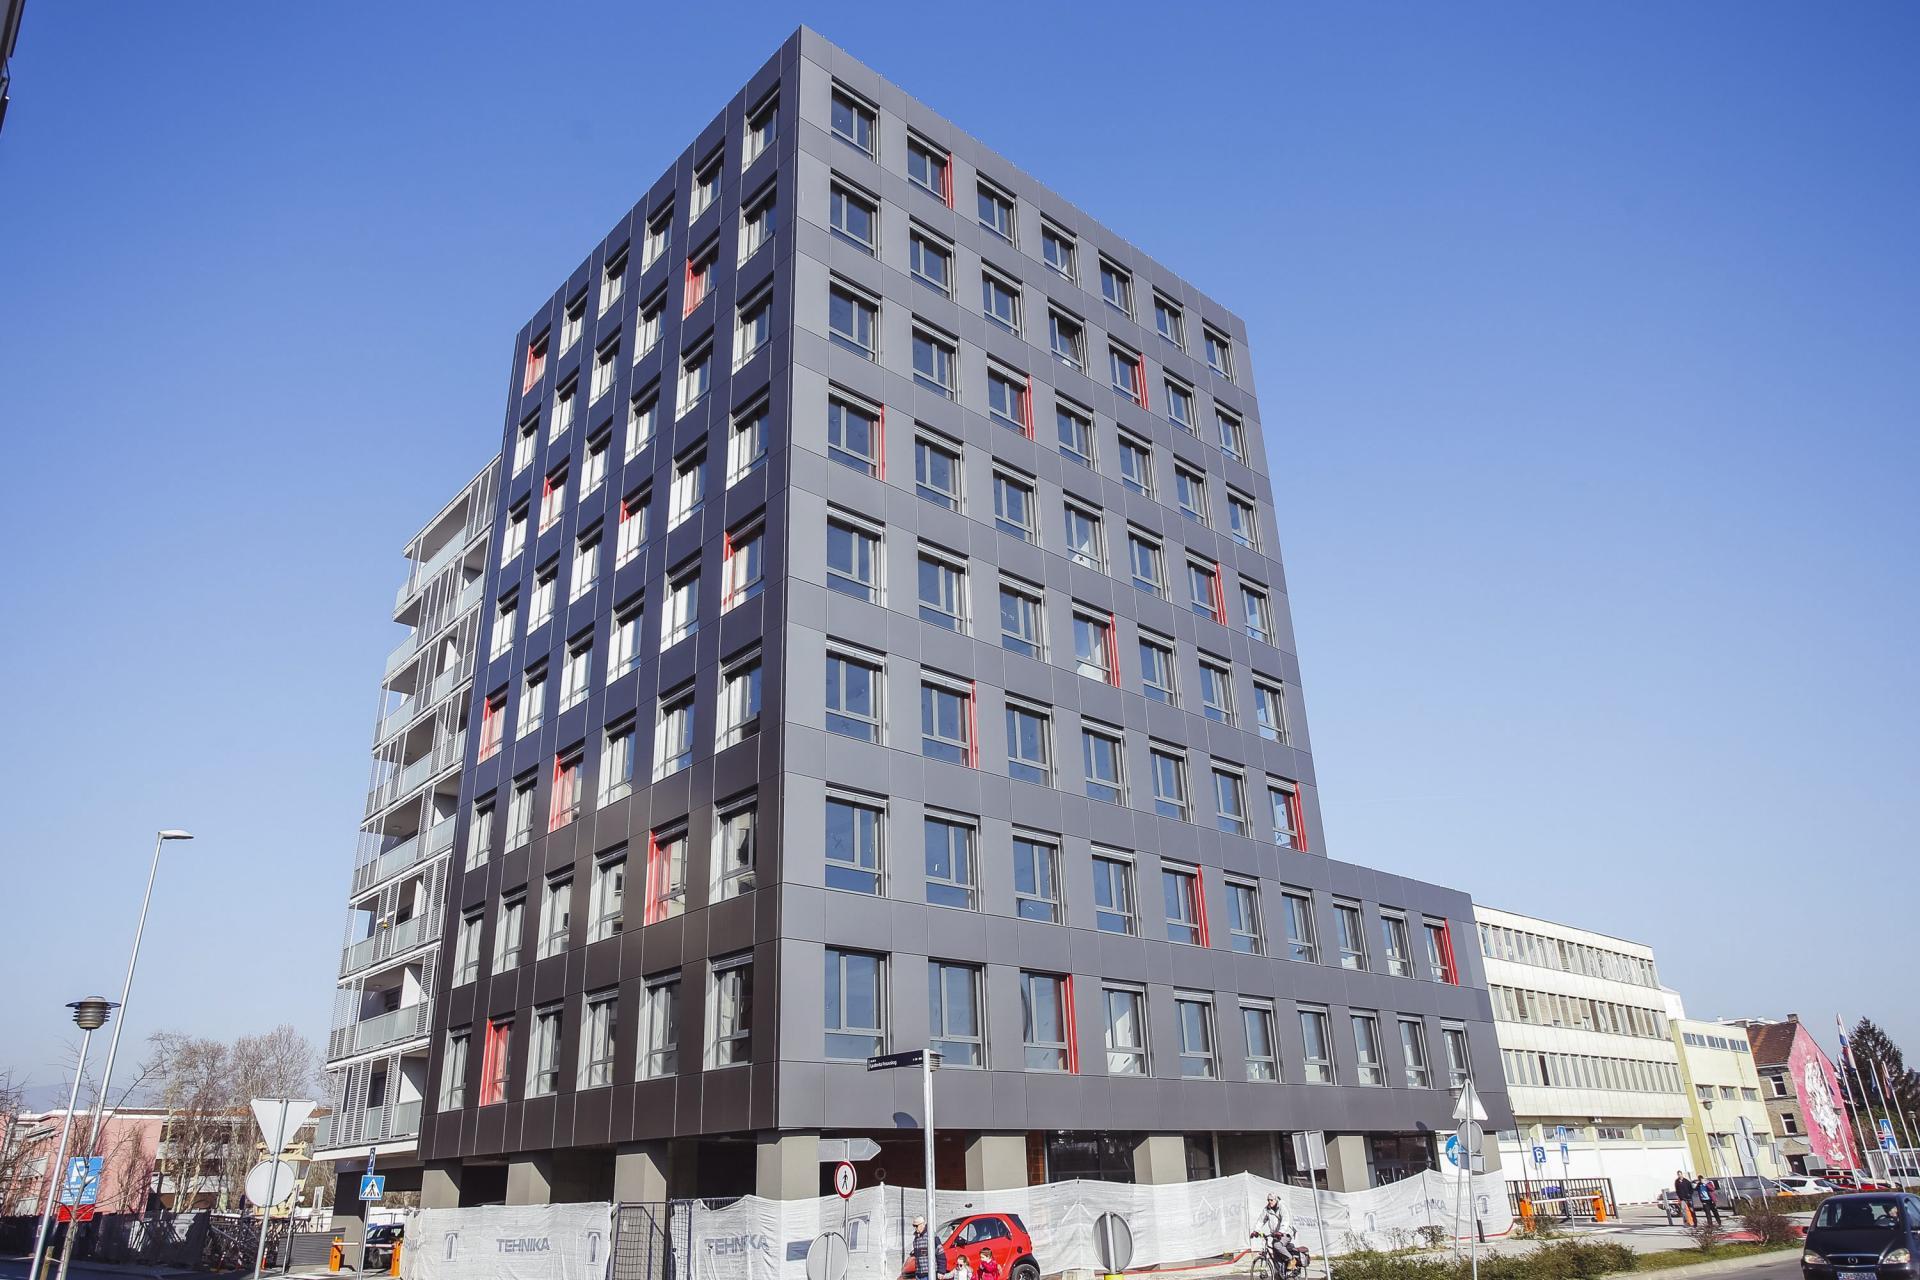 zgrade_gradnja1-300118